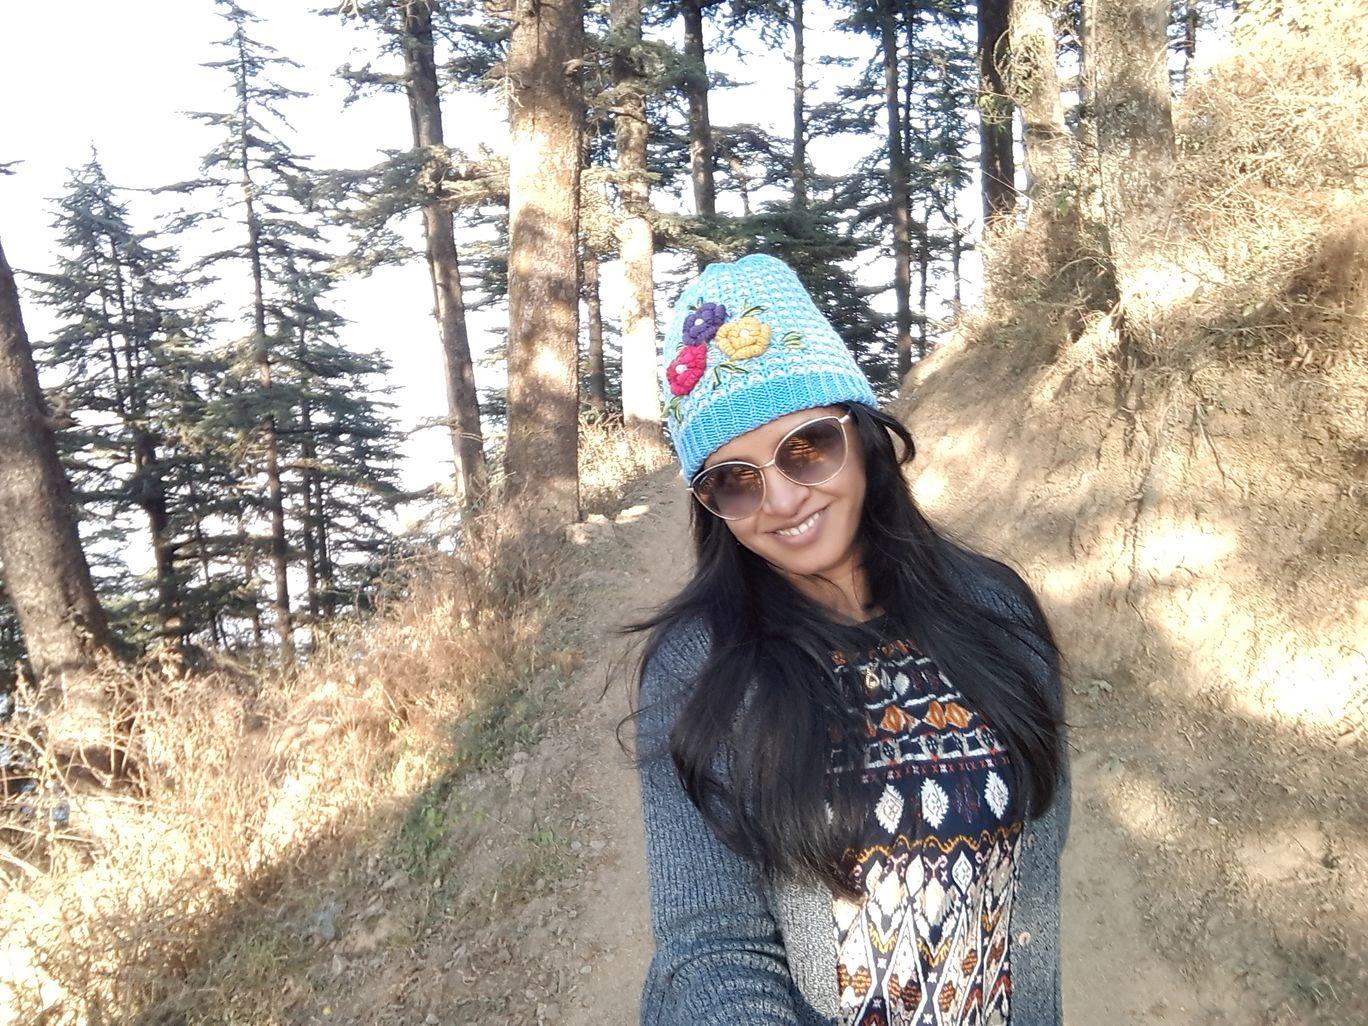 Photo of Shimla By Anita khairnar